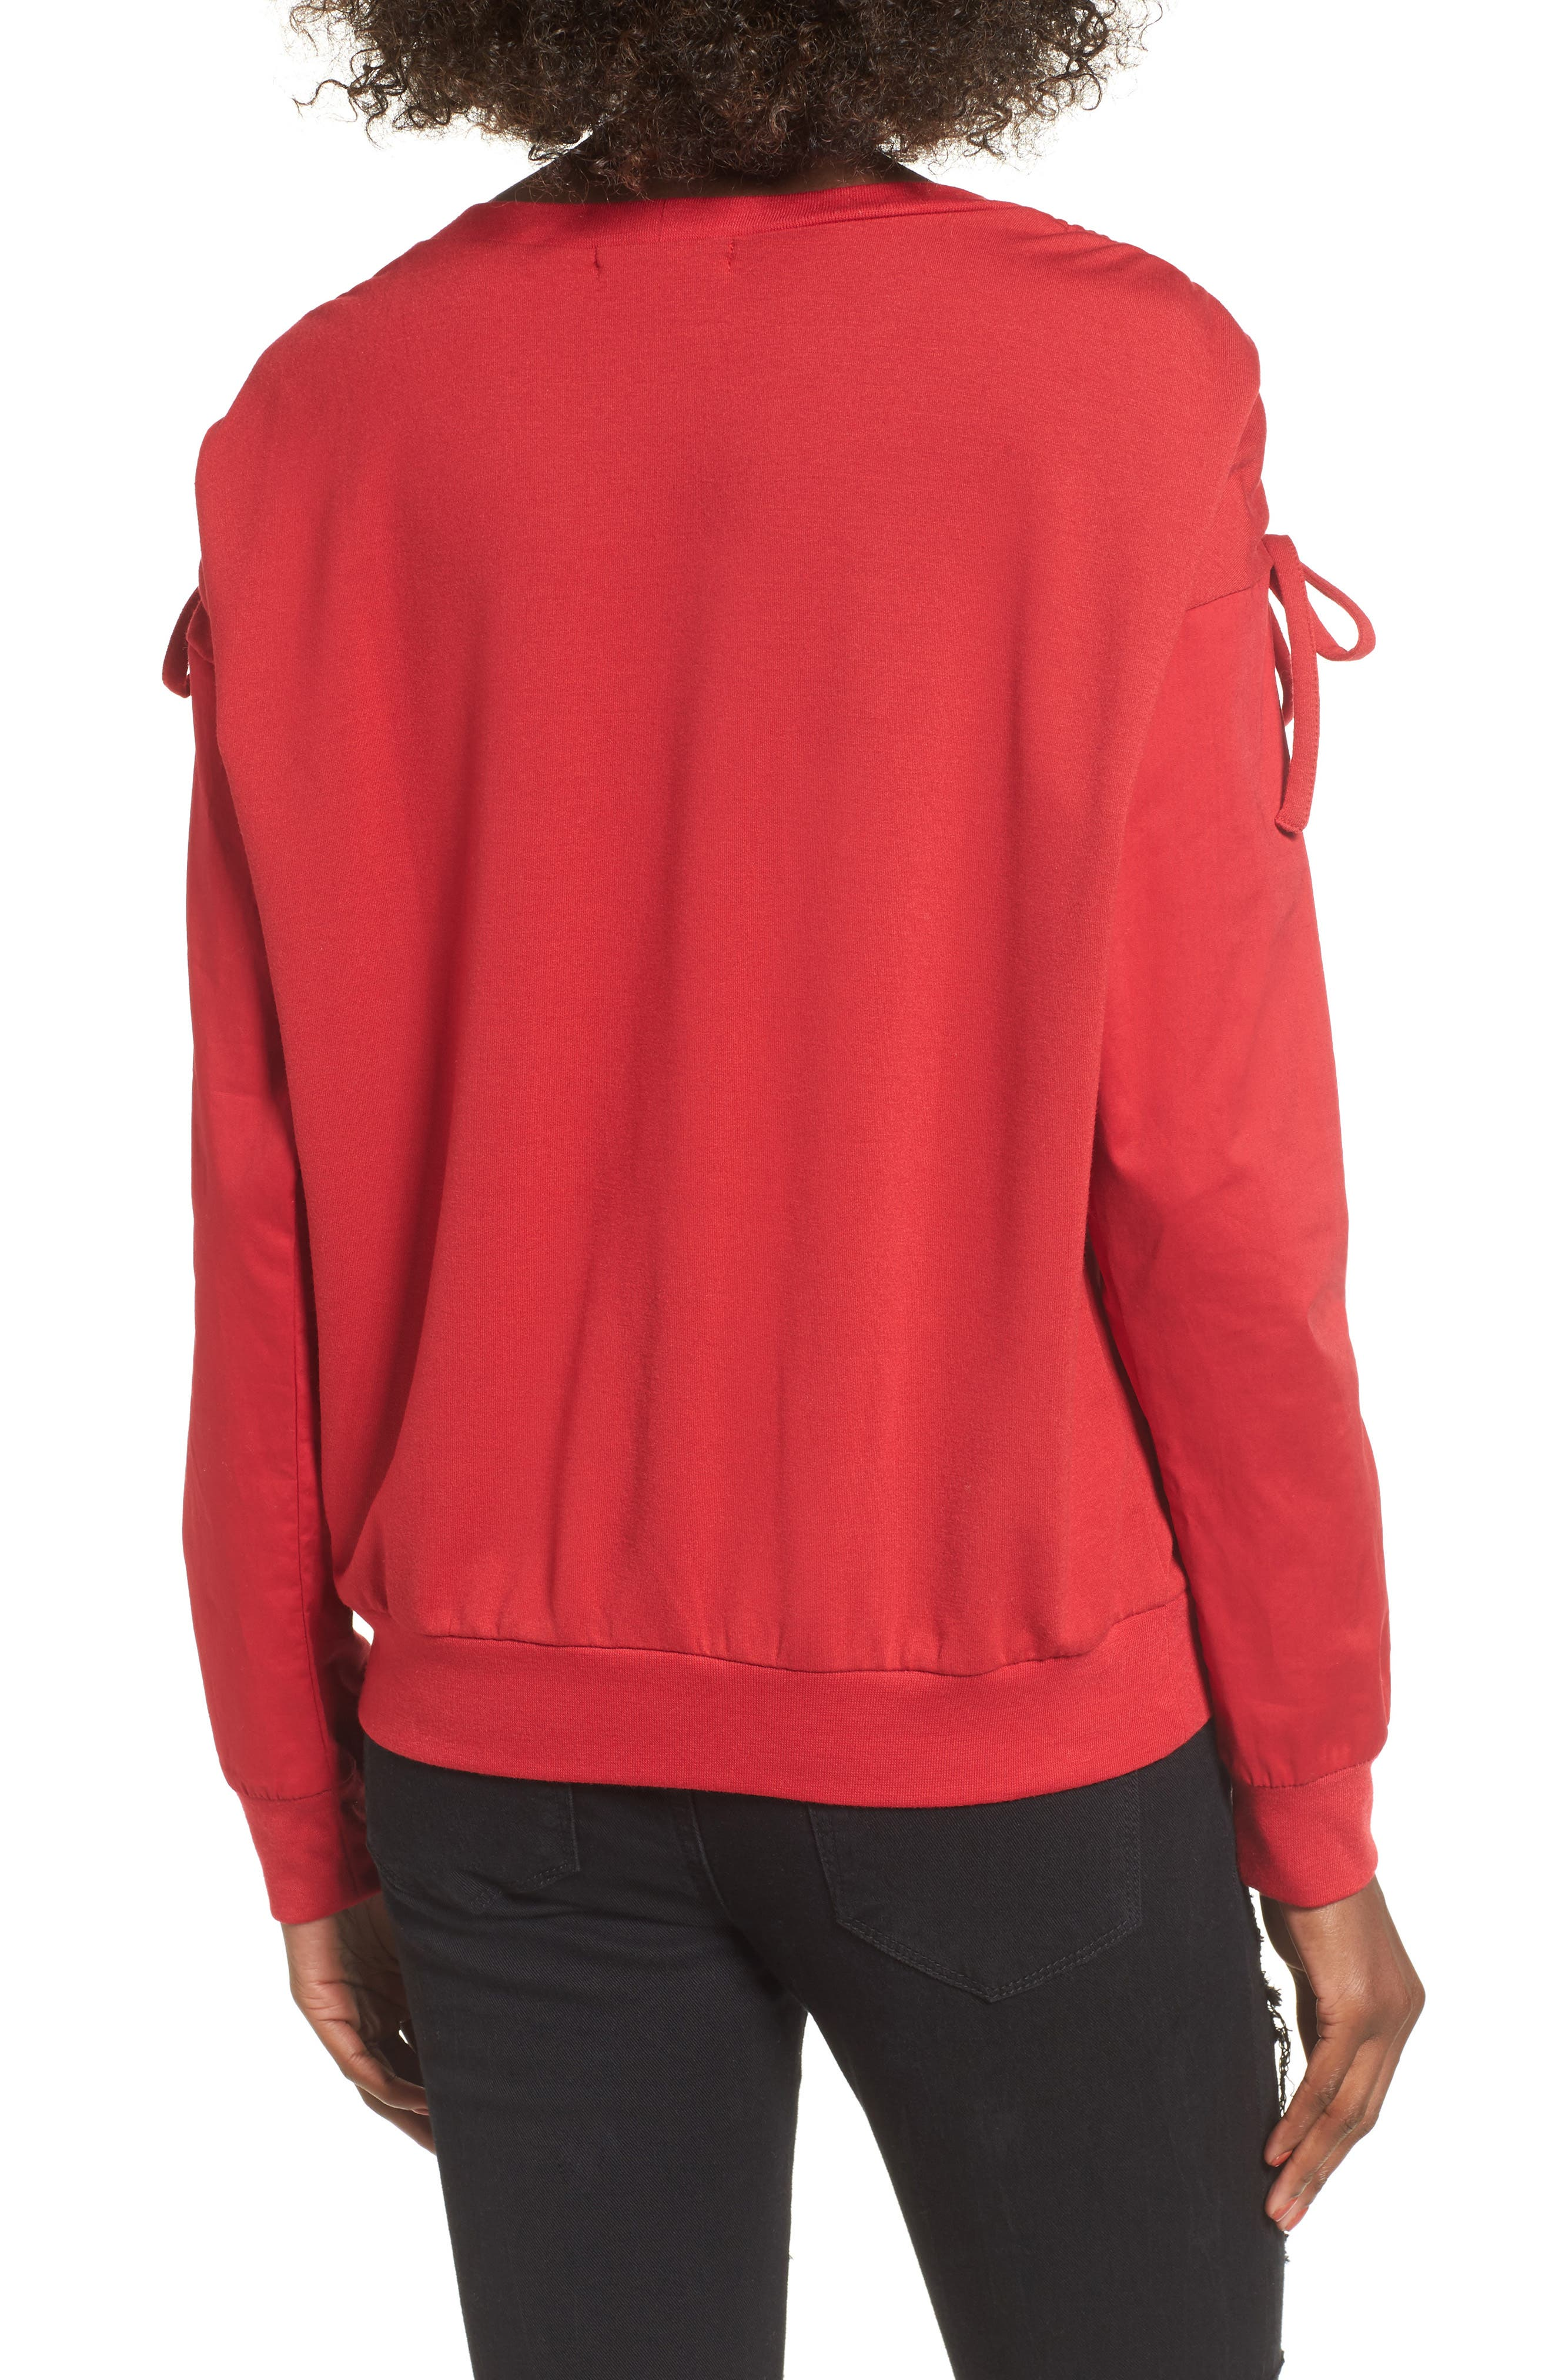 Cinch Sleeve Sweatshirt,                             Alternate thumbnail 2, color,                             603